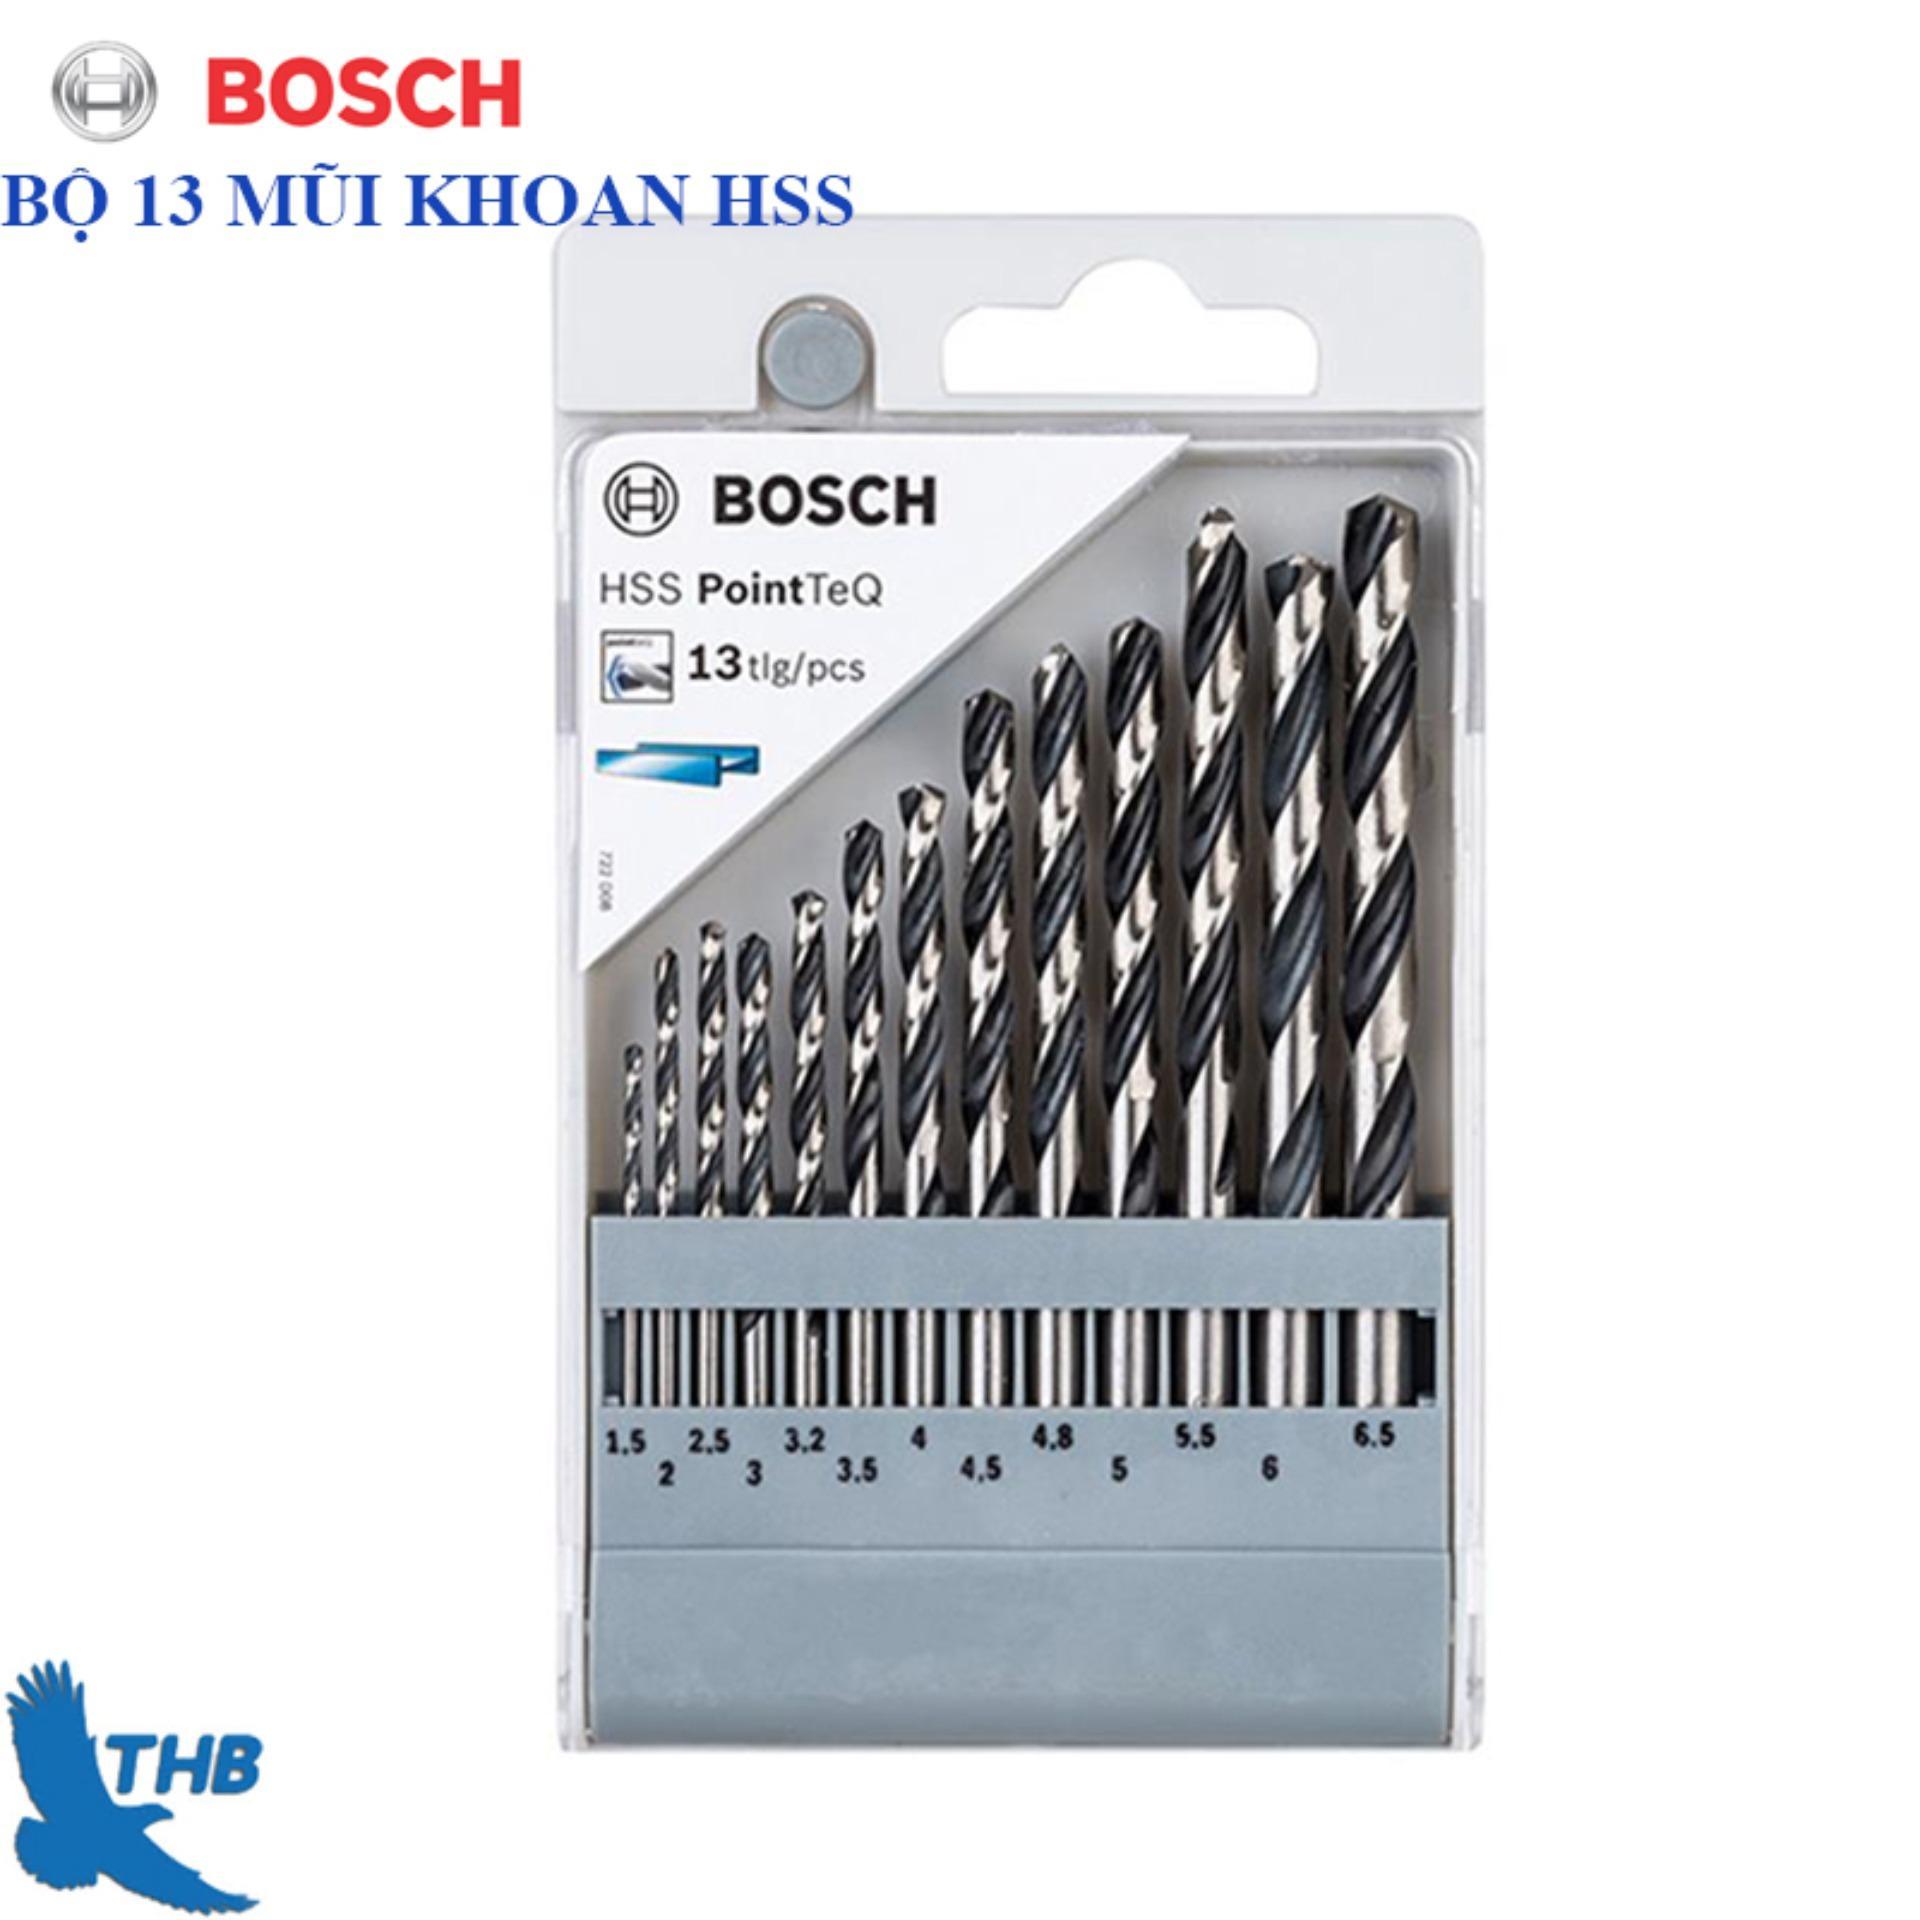 Bộ 13 mũi khoan Bosch HSS Point-2608577349